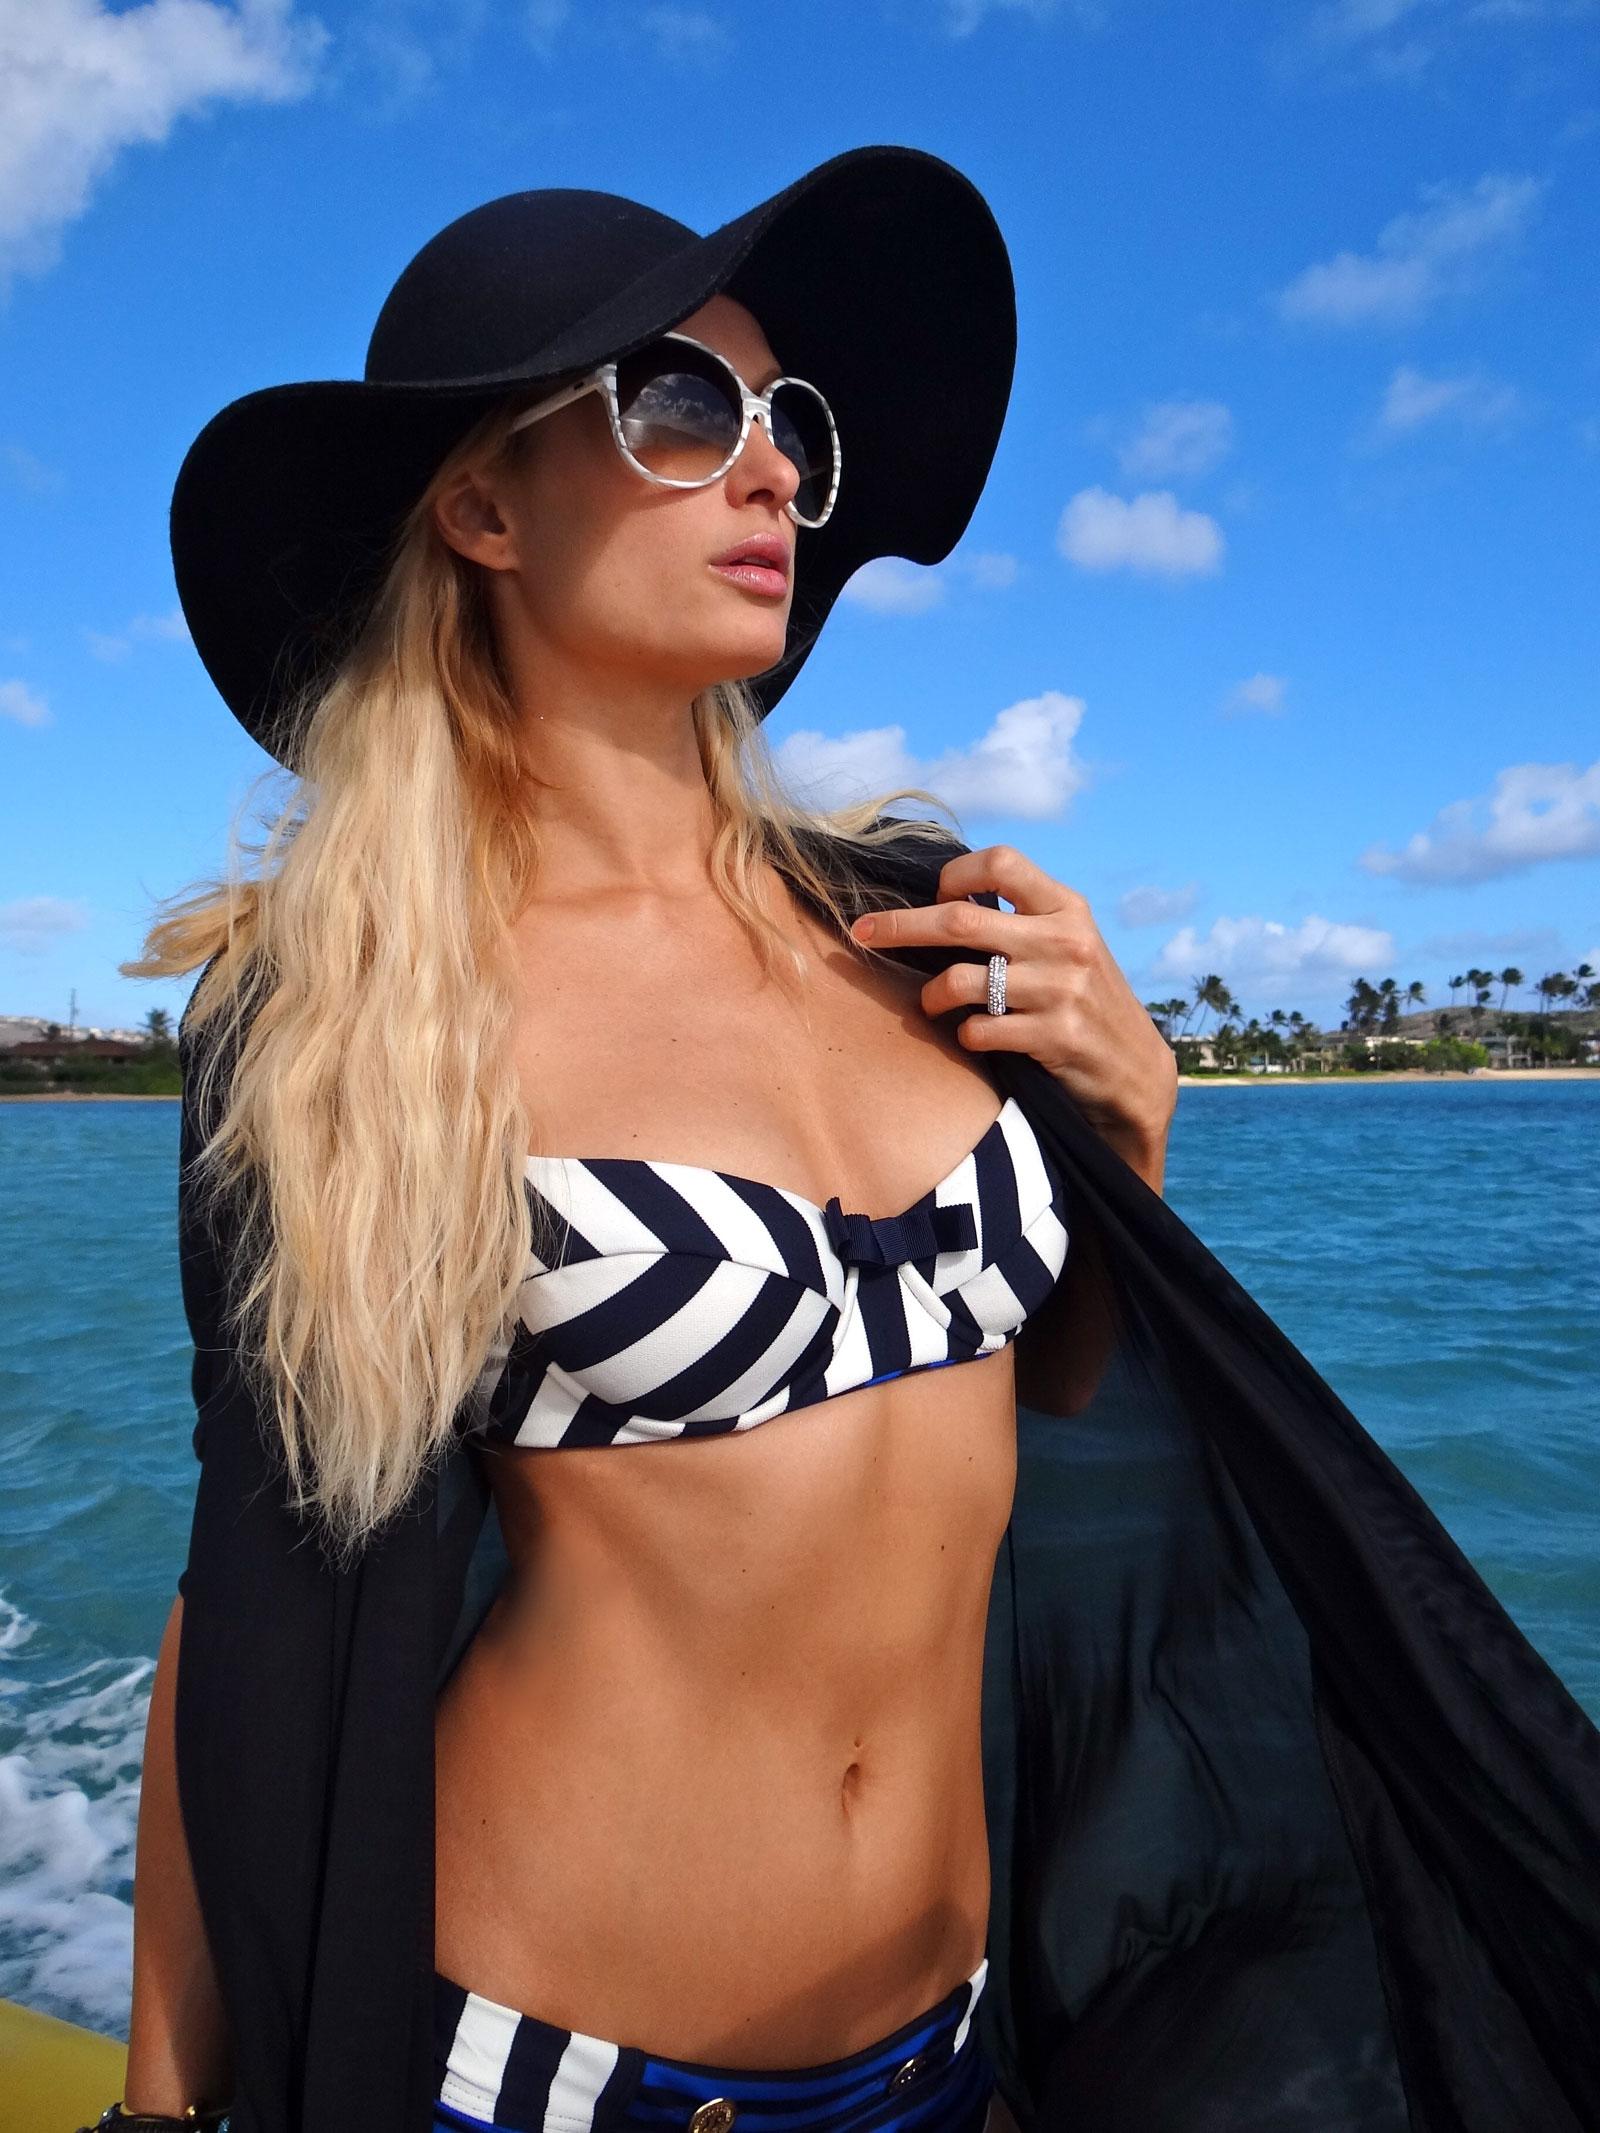 Cyrus bikini photo hilton